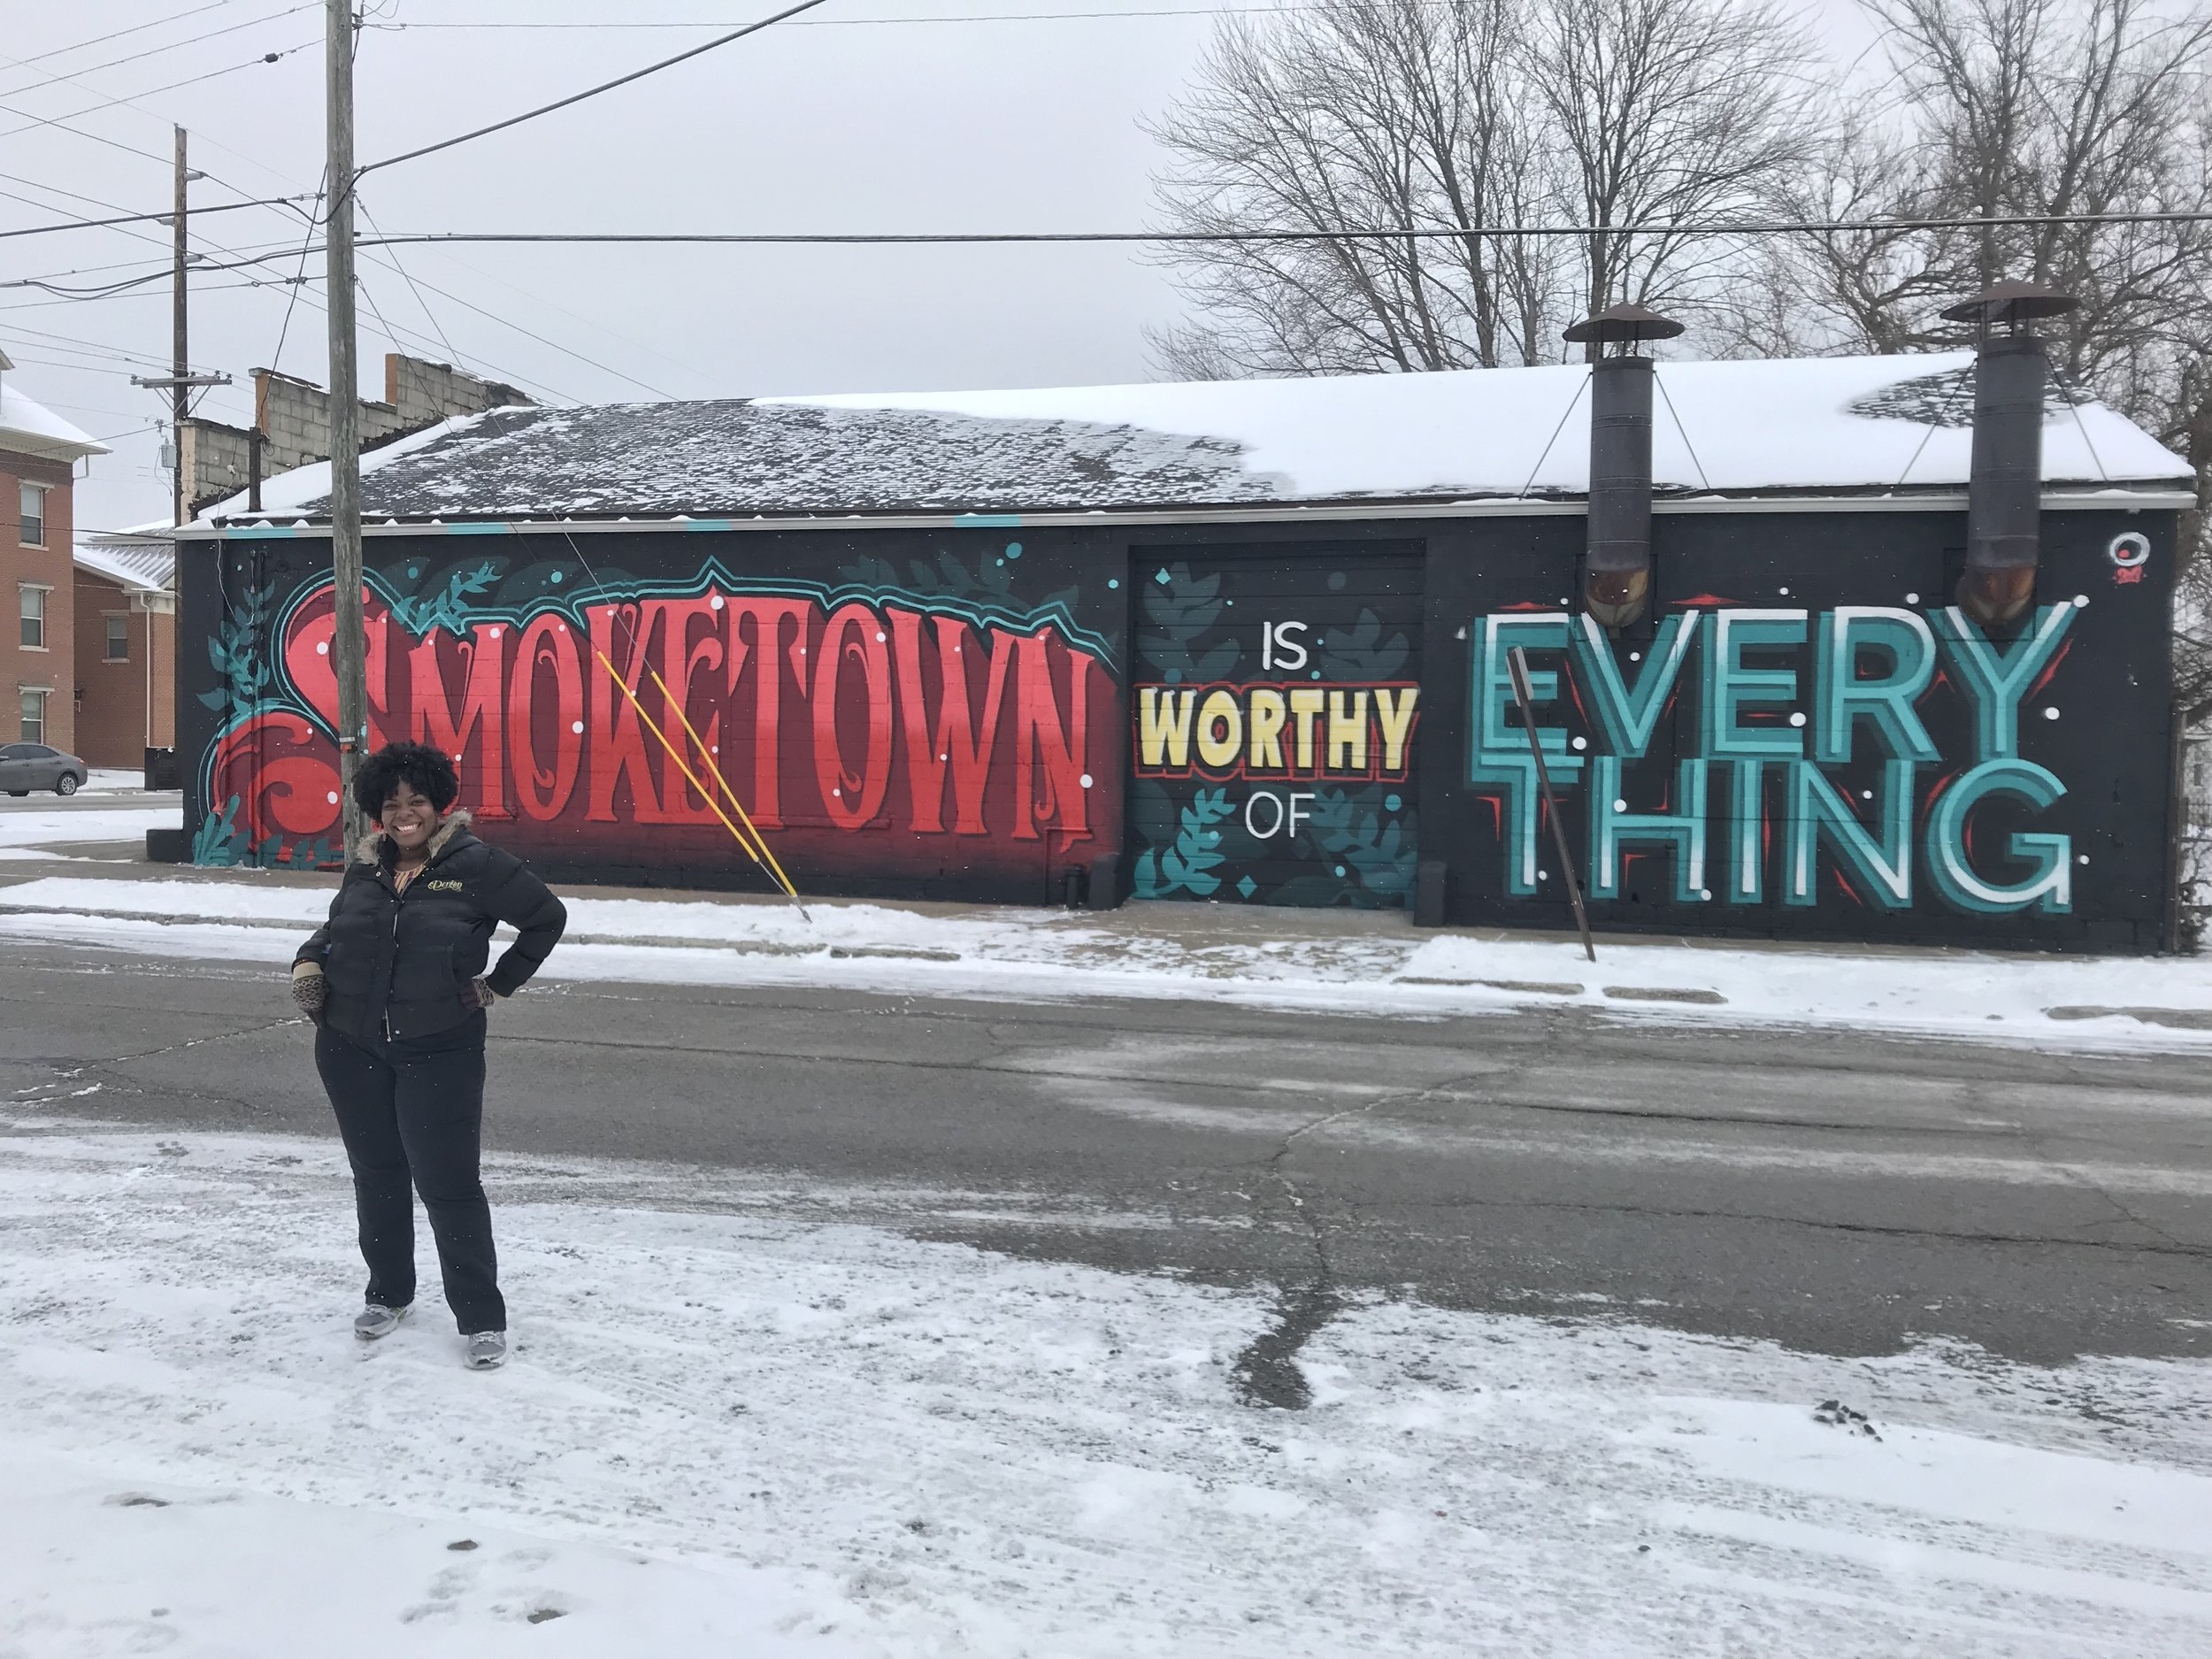 Smoketown pic 1-17-18.jpg